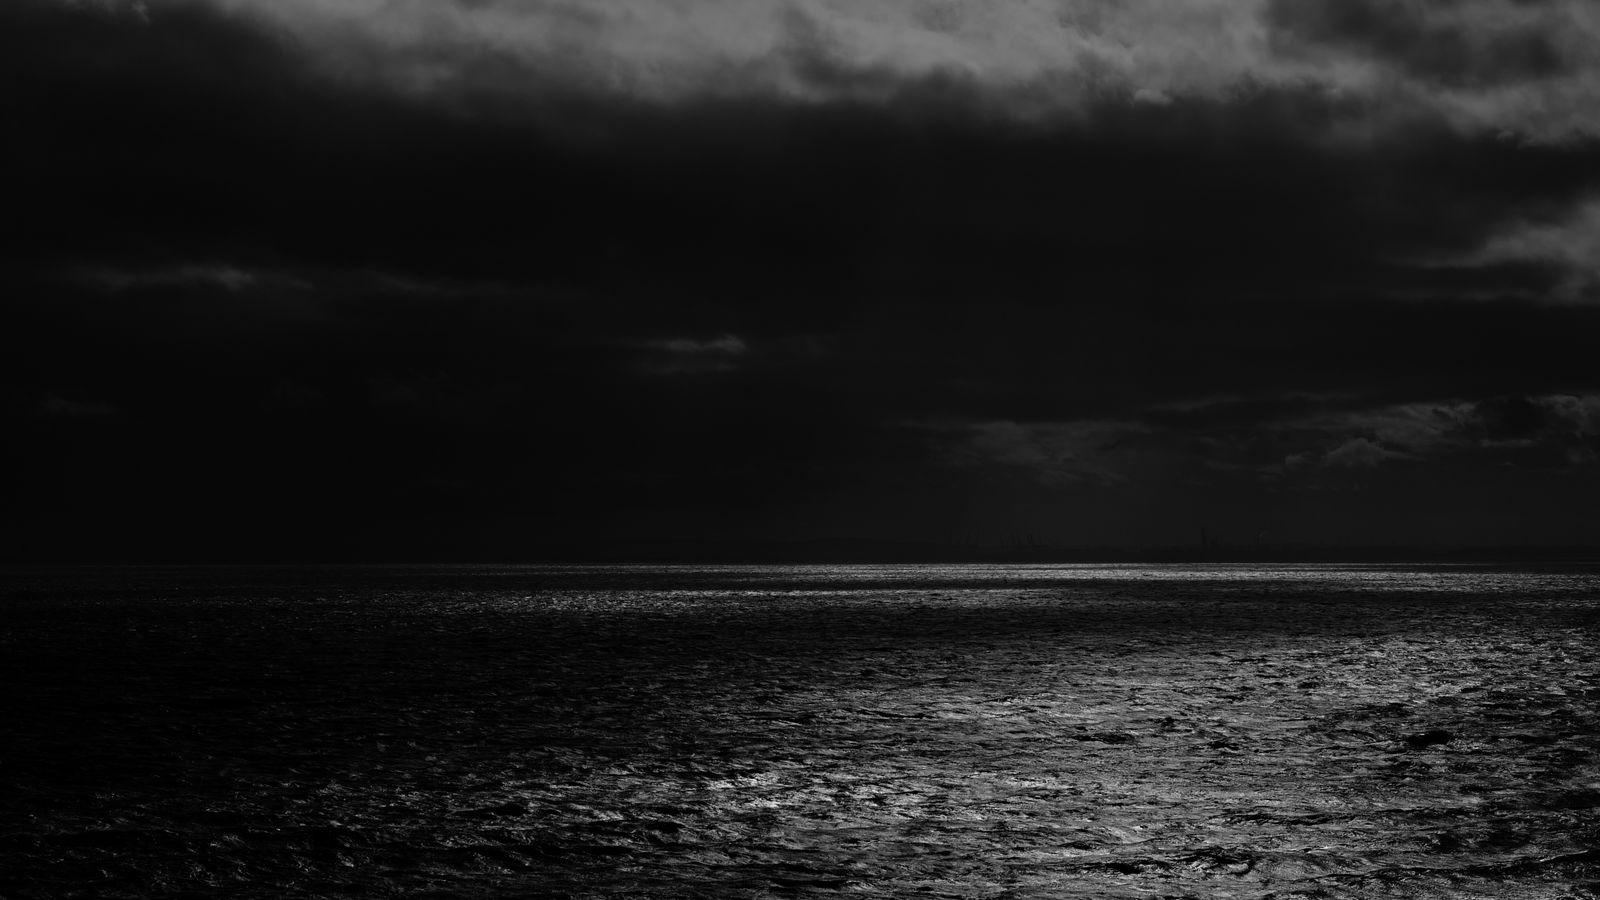 1600x900 Wallpaper sea, horizon, bw, overcast, clouds, ripples